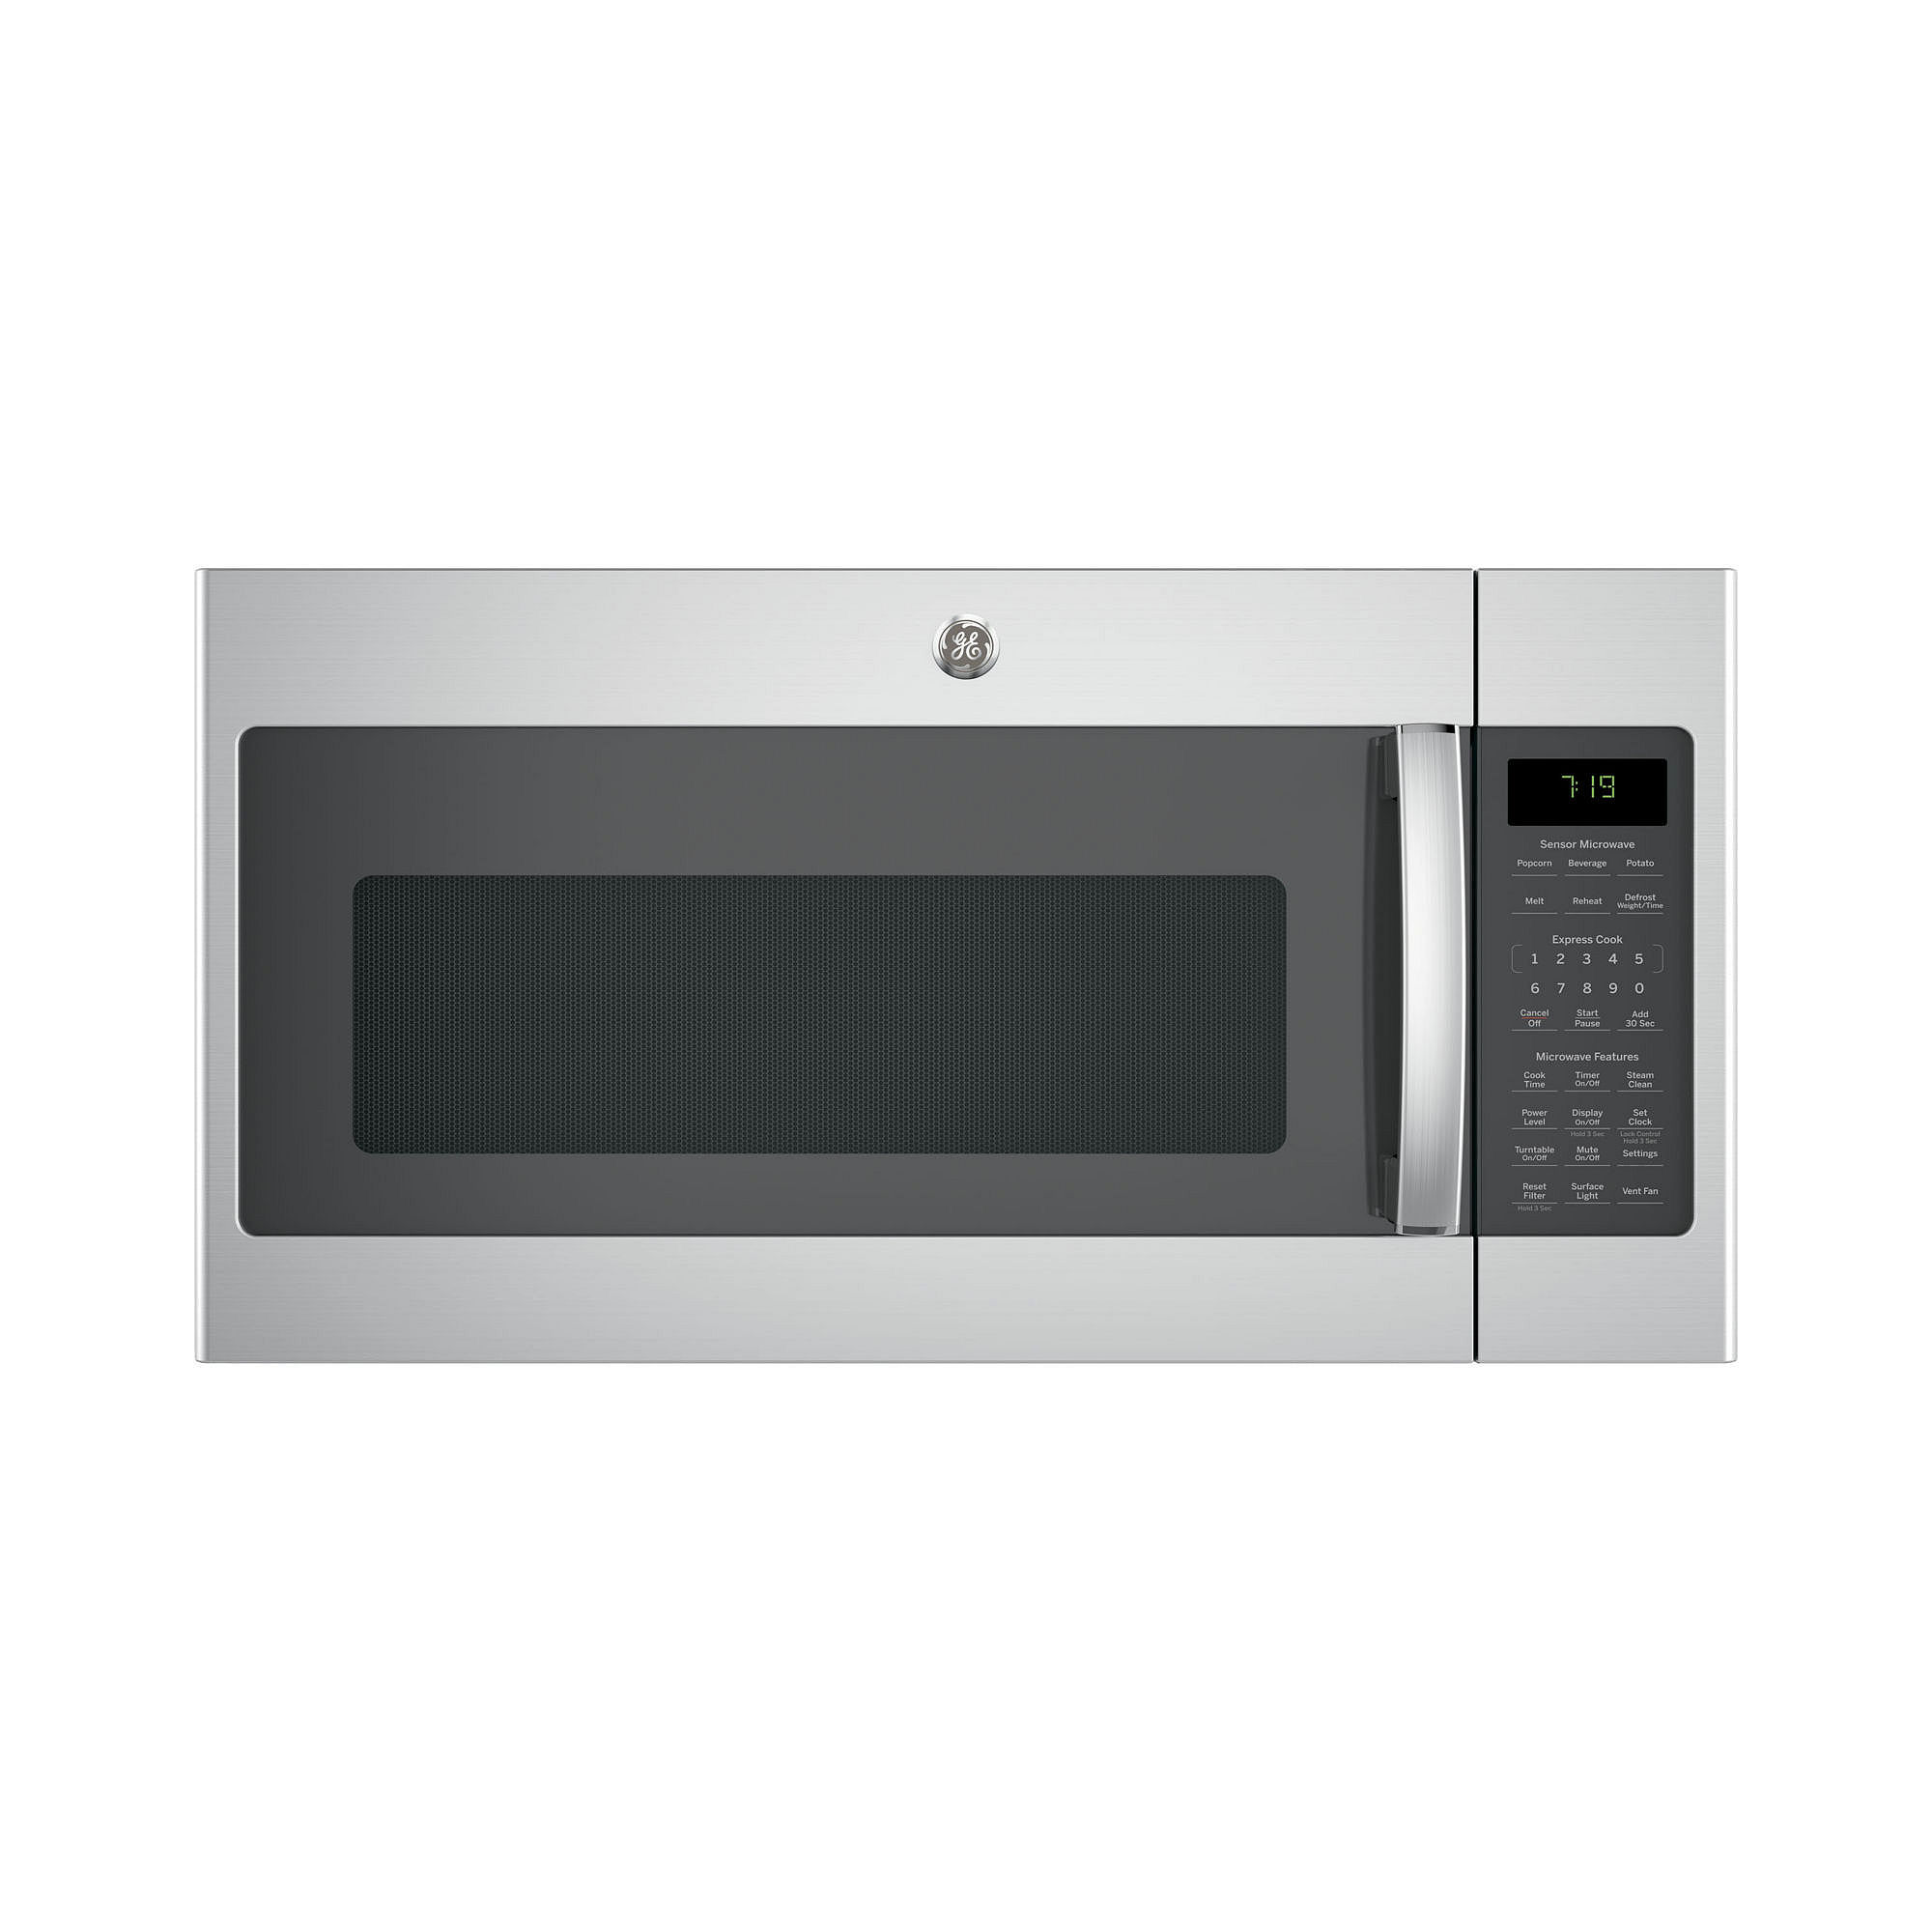 Ge appliances coupon code